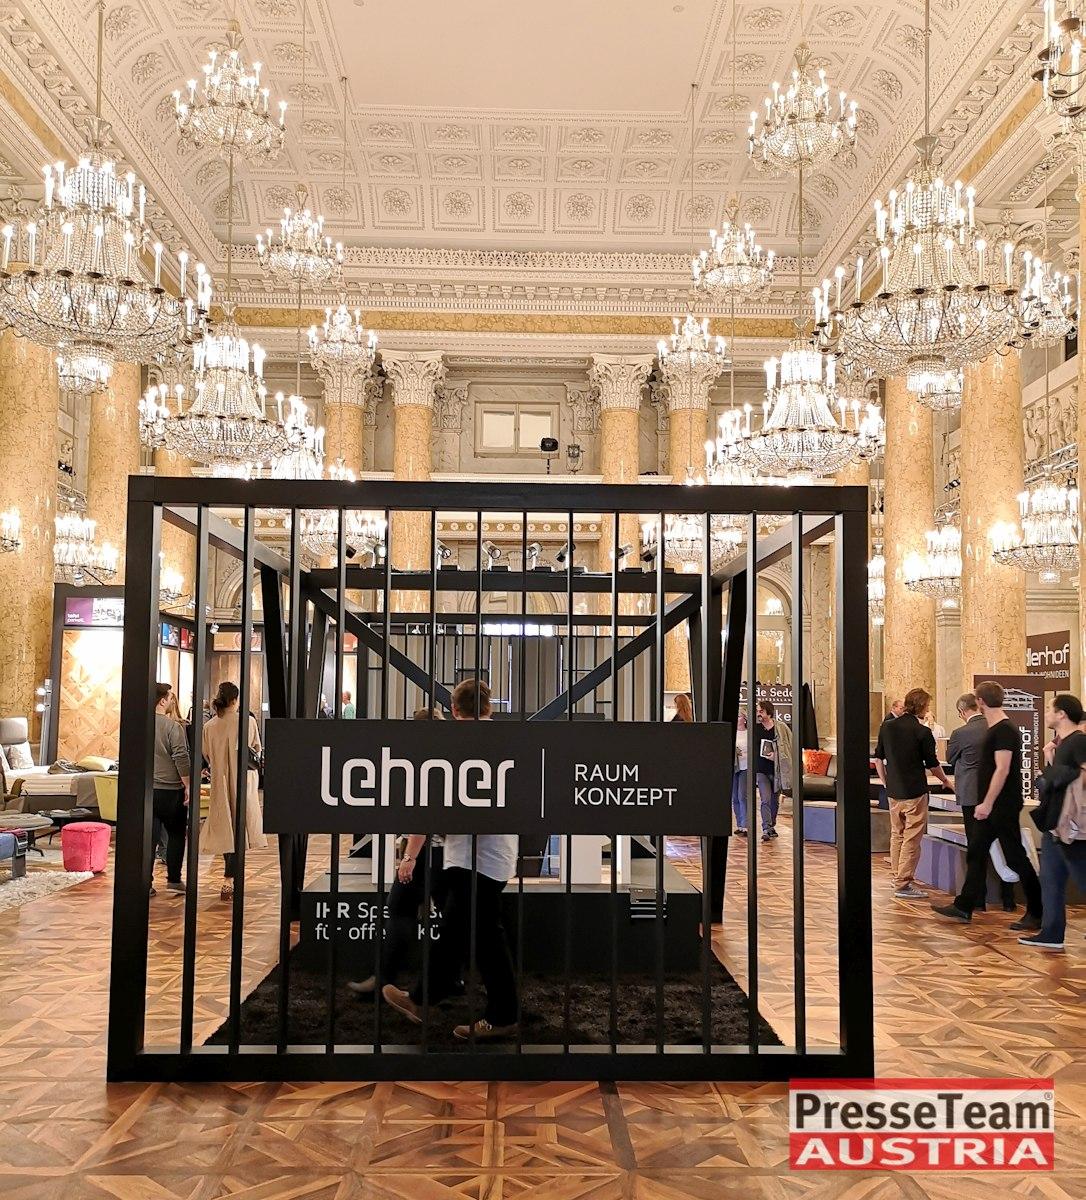 Messe Hofburg Wien 85 - Luxus Möbelmesse & Lifestyle in der Hofburg Wien